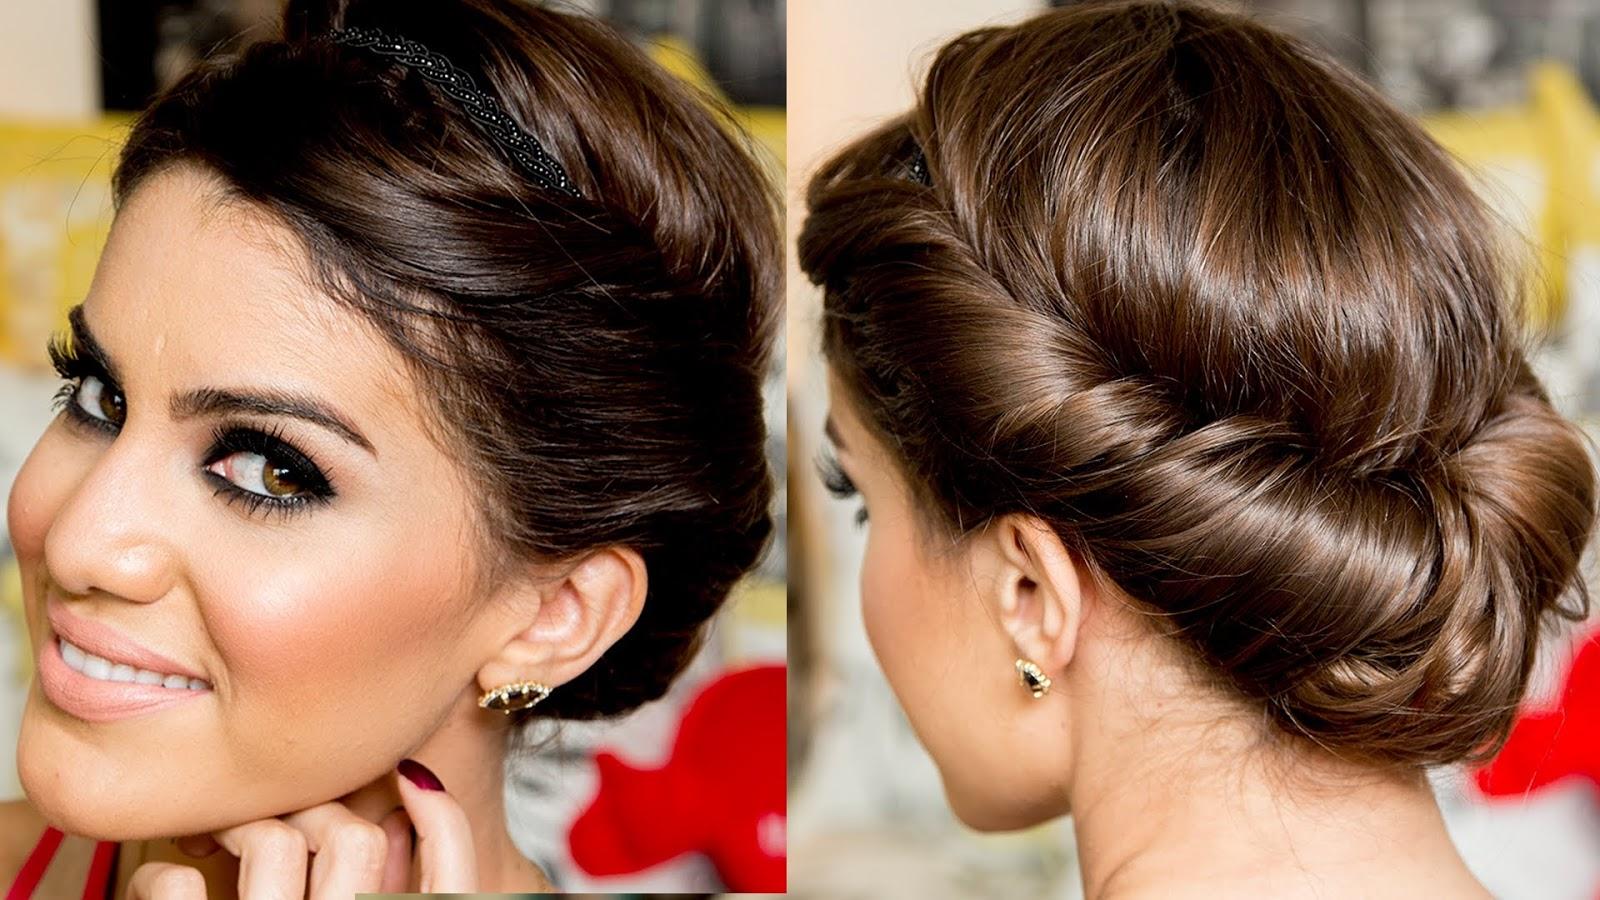 christian bridal hairstyles for long hair | fade haircut